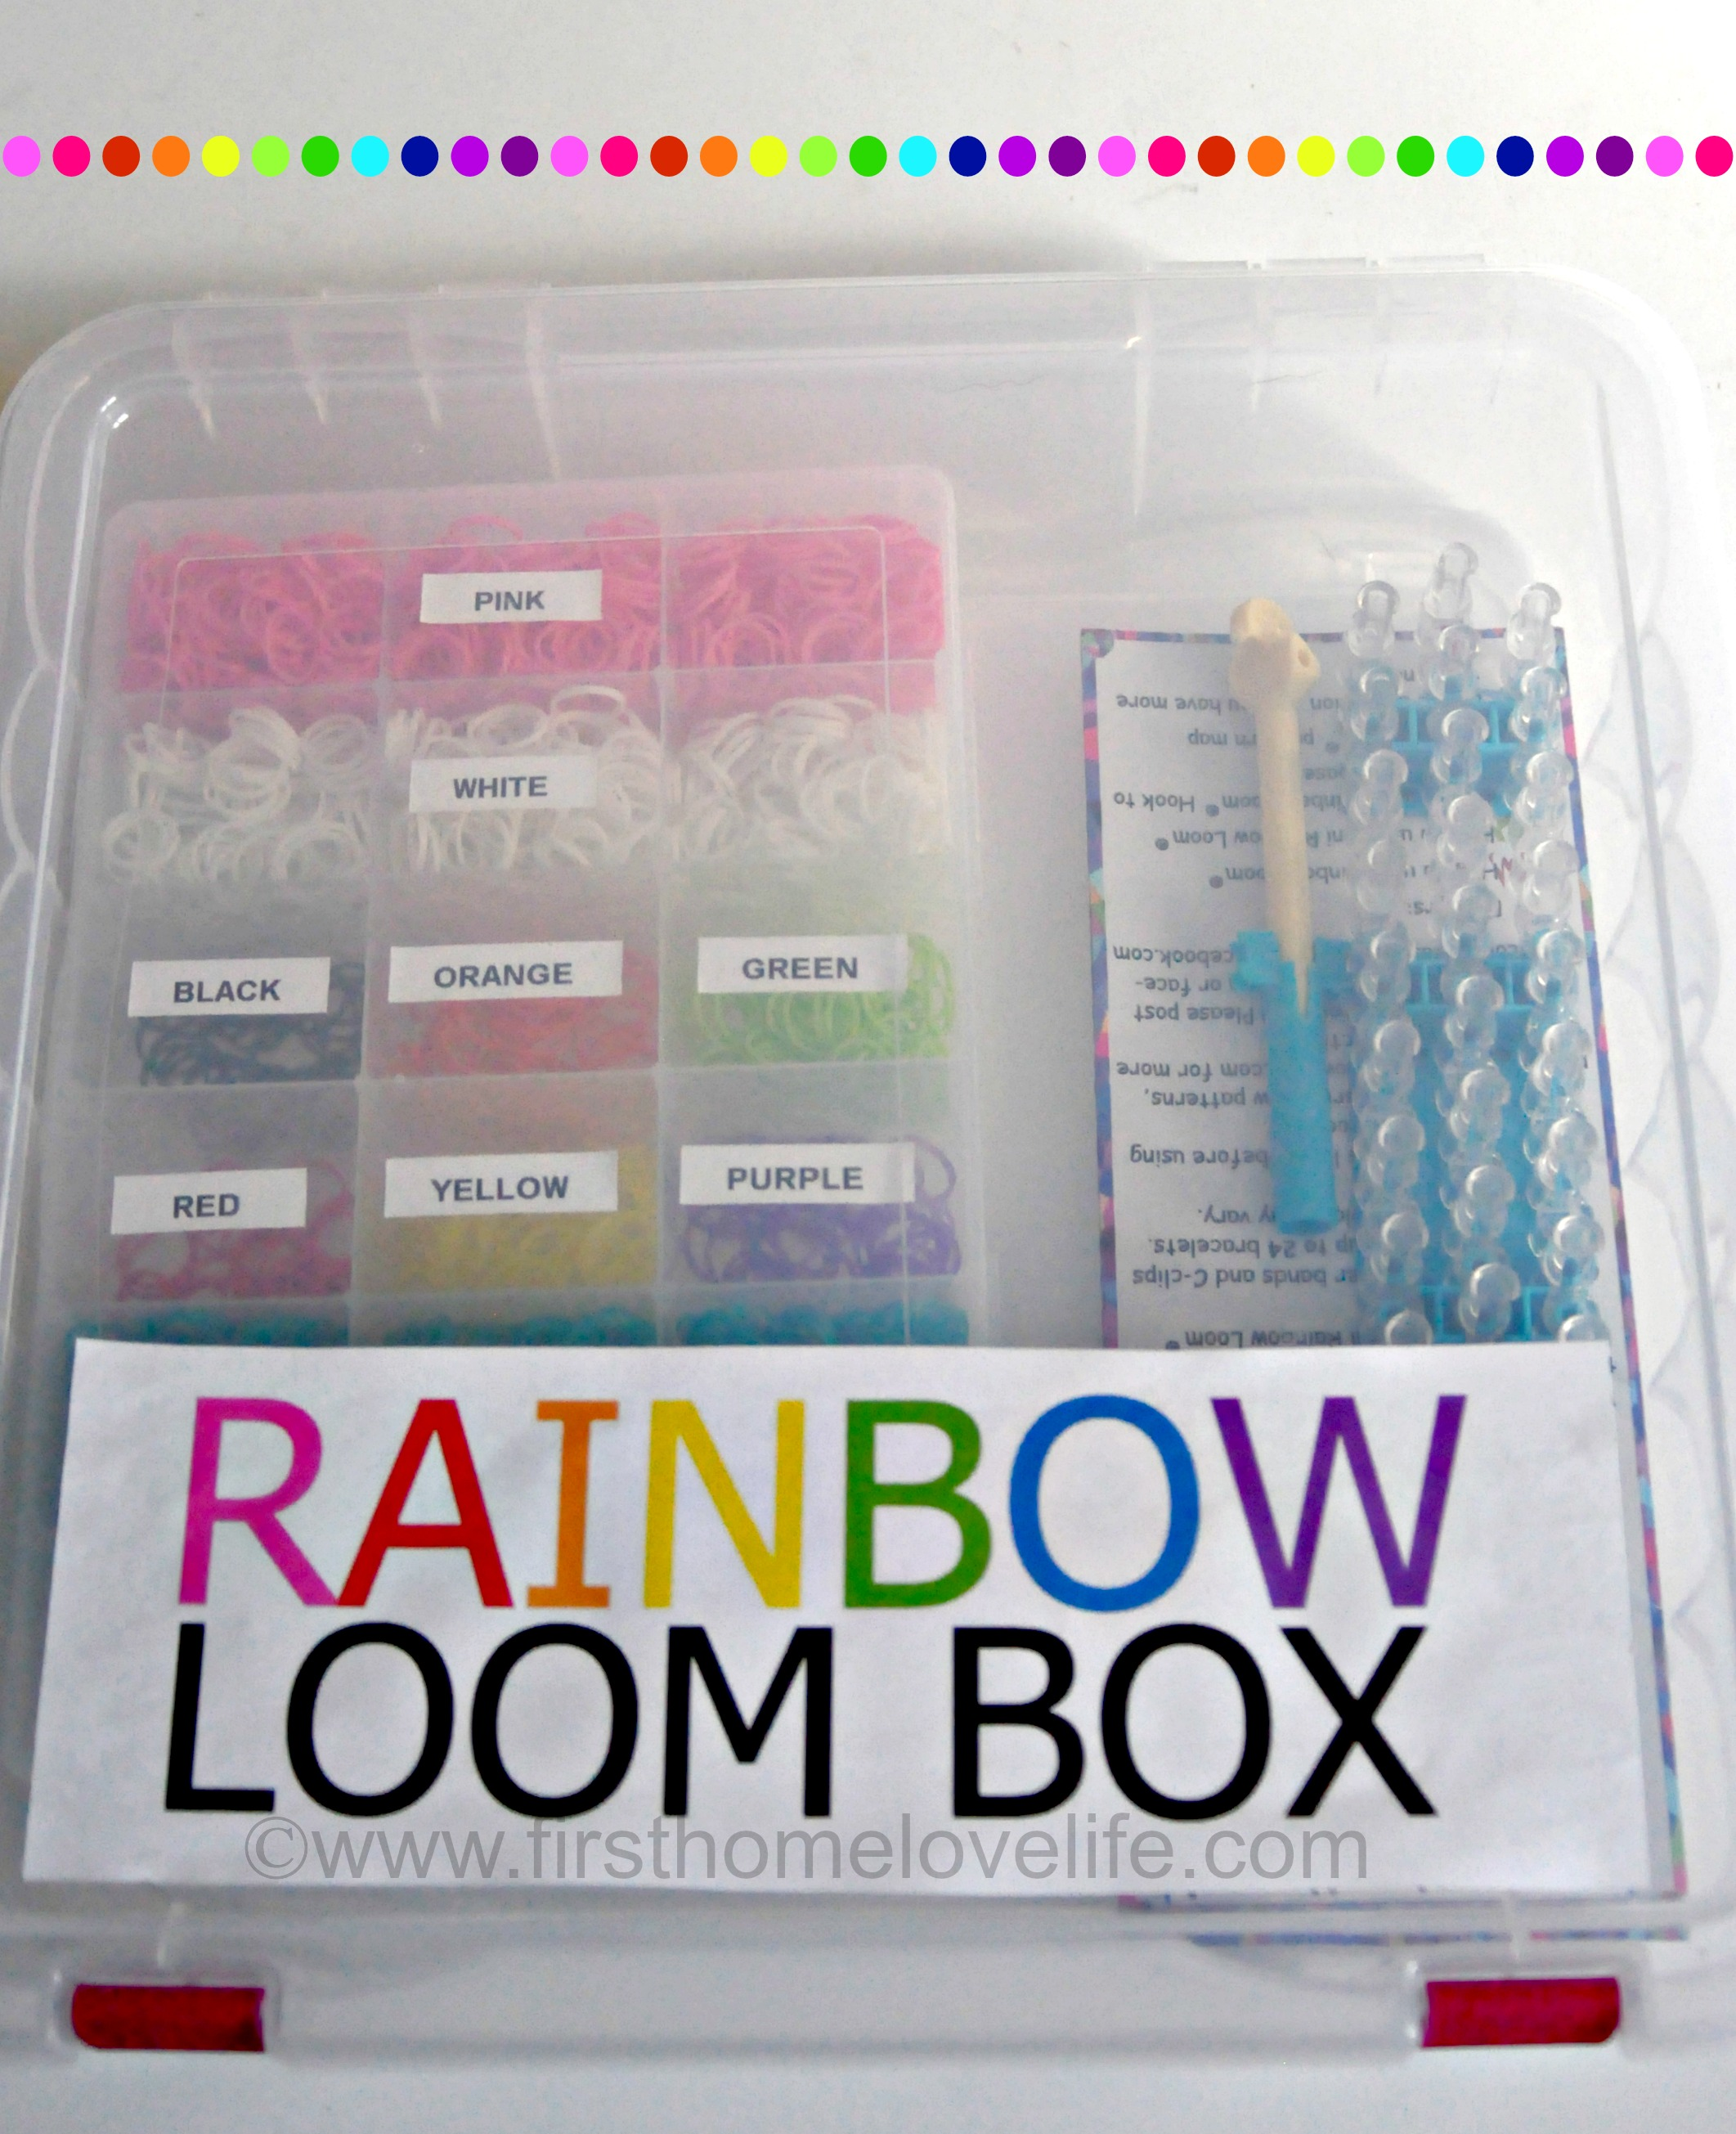 Rainbow Loom Storage Box First Home Love Life